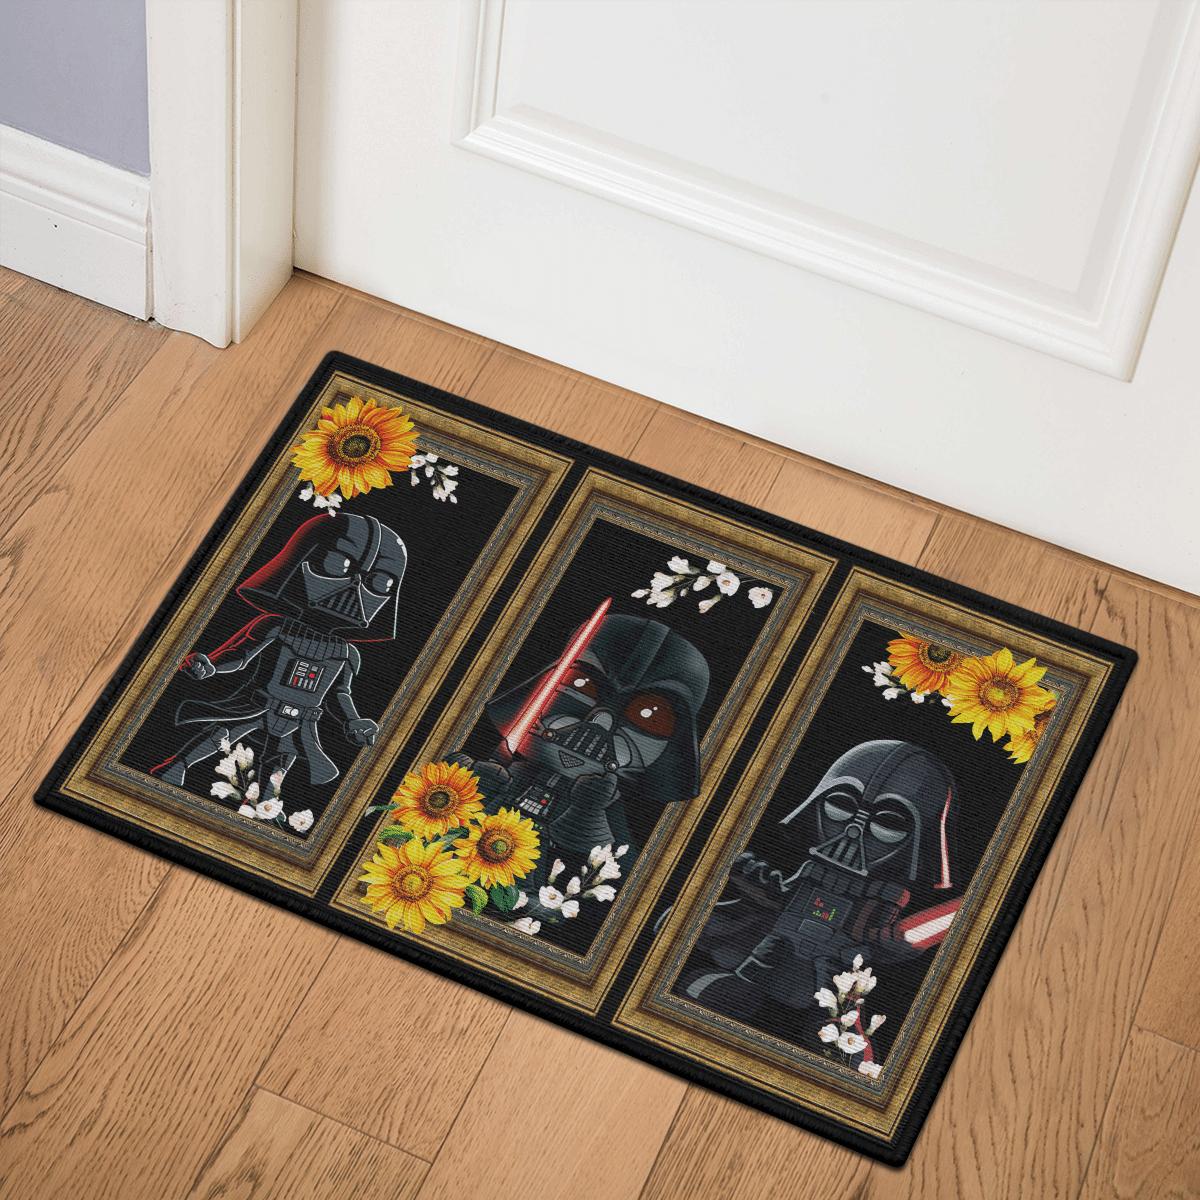 Darth Vader sunflowers doormat 2